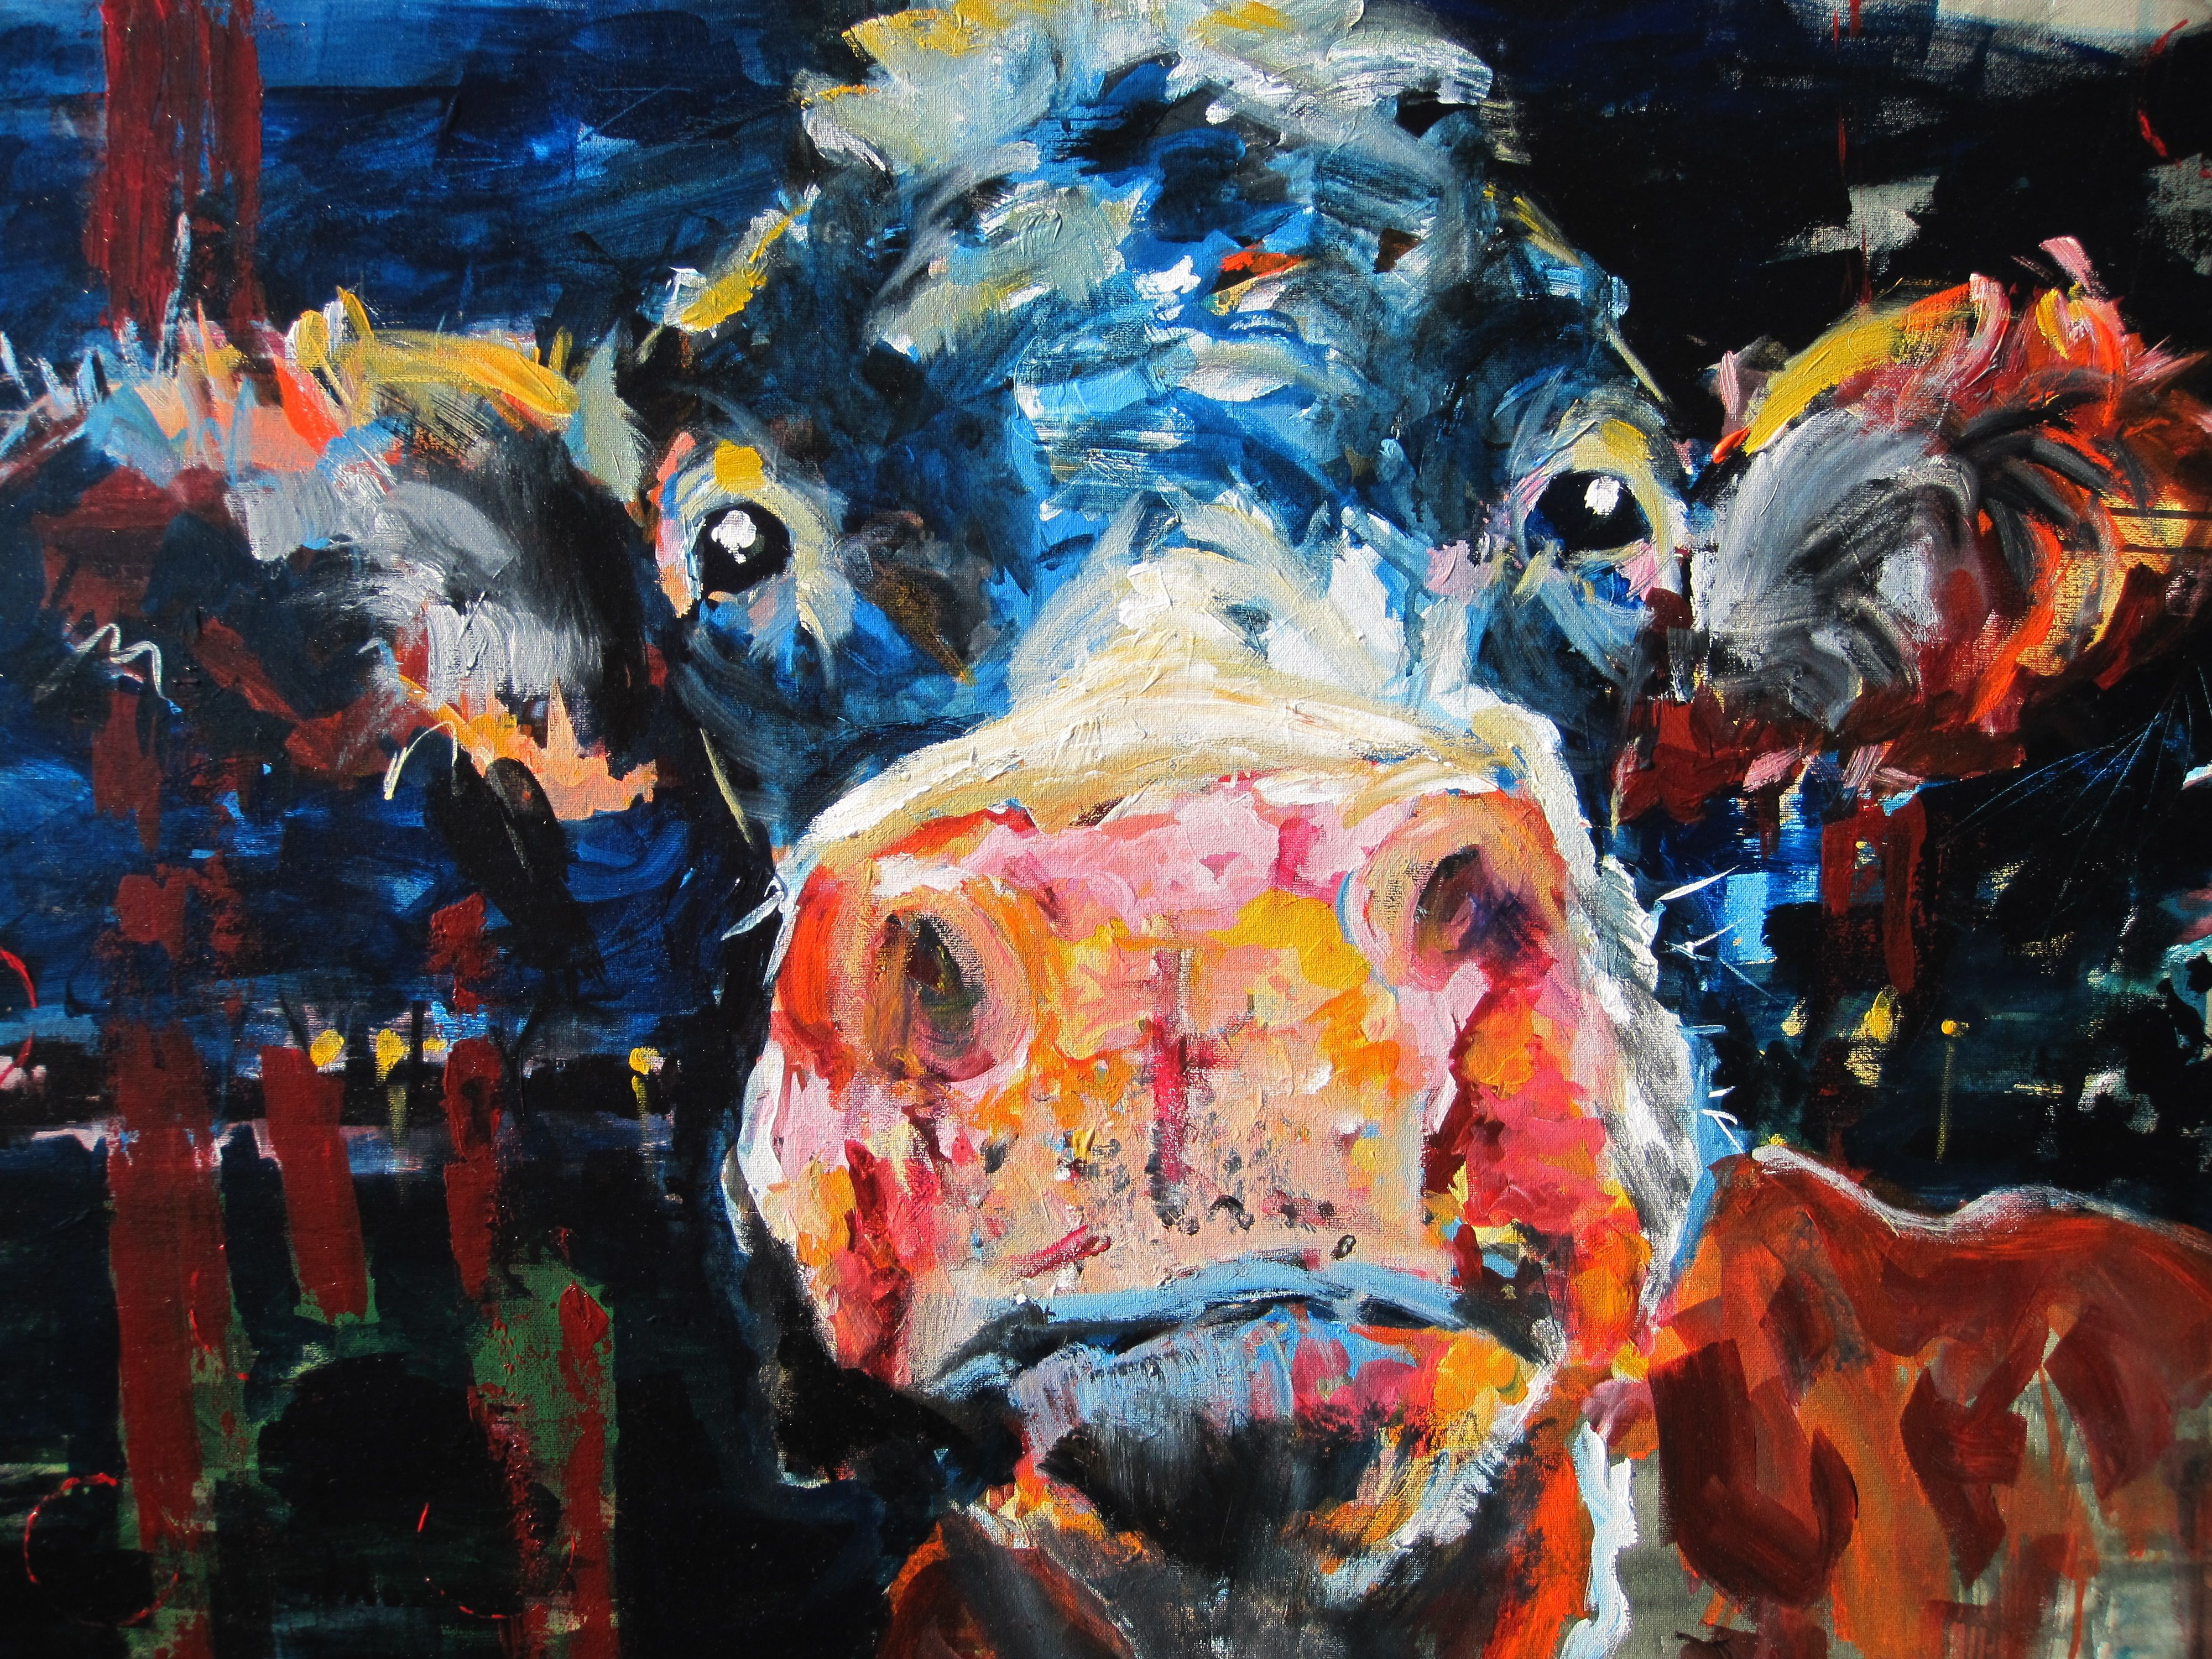 Cow by Heidi Nuyts 80 x 100 Acrylics on canvas